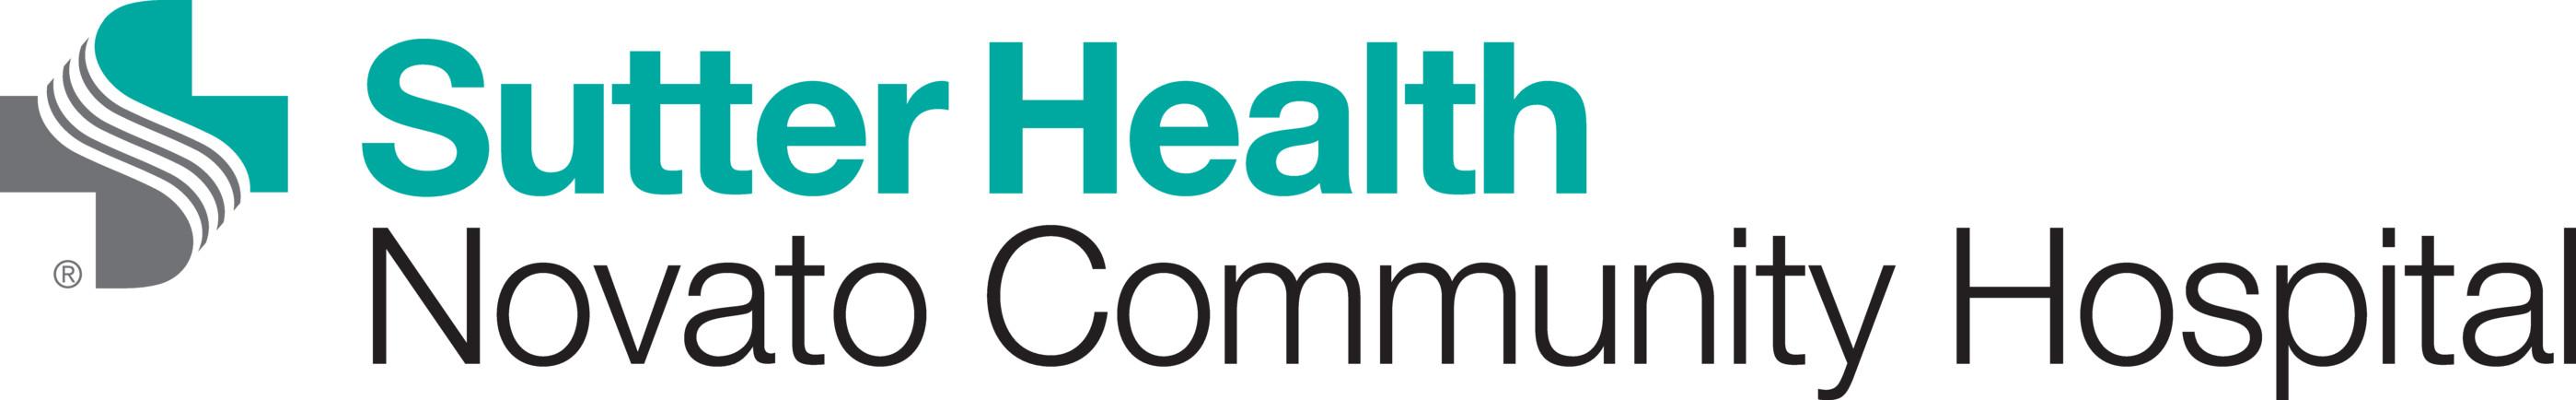 Sutter Novato Community Hospital logo